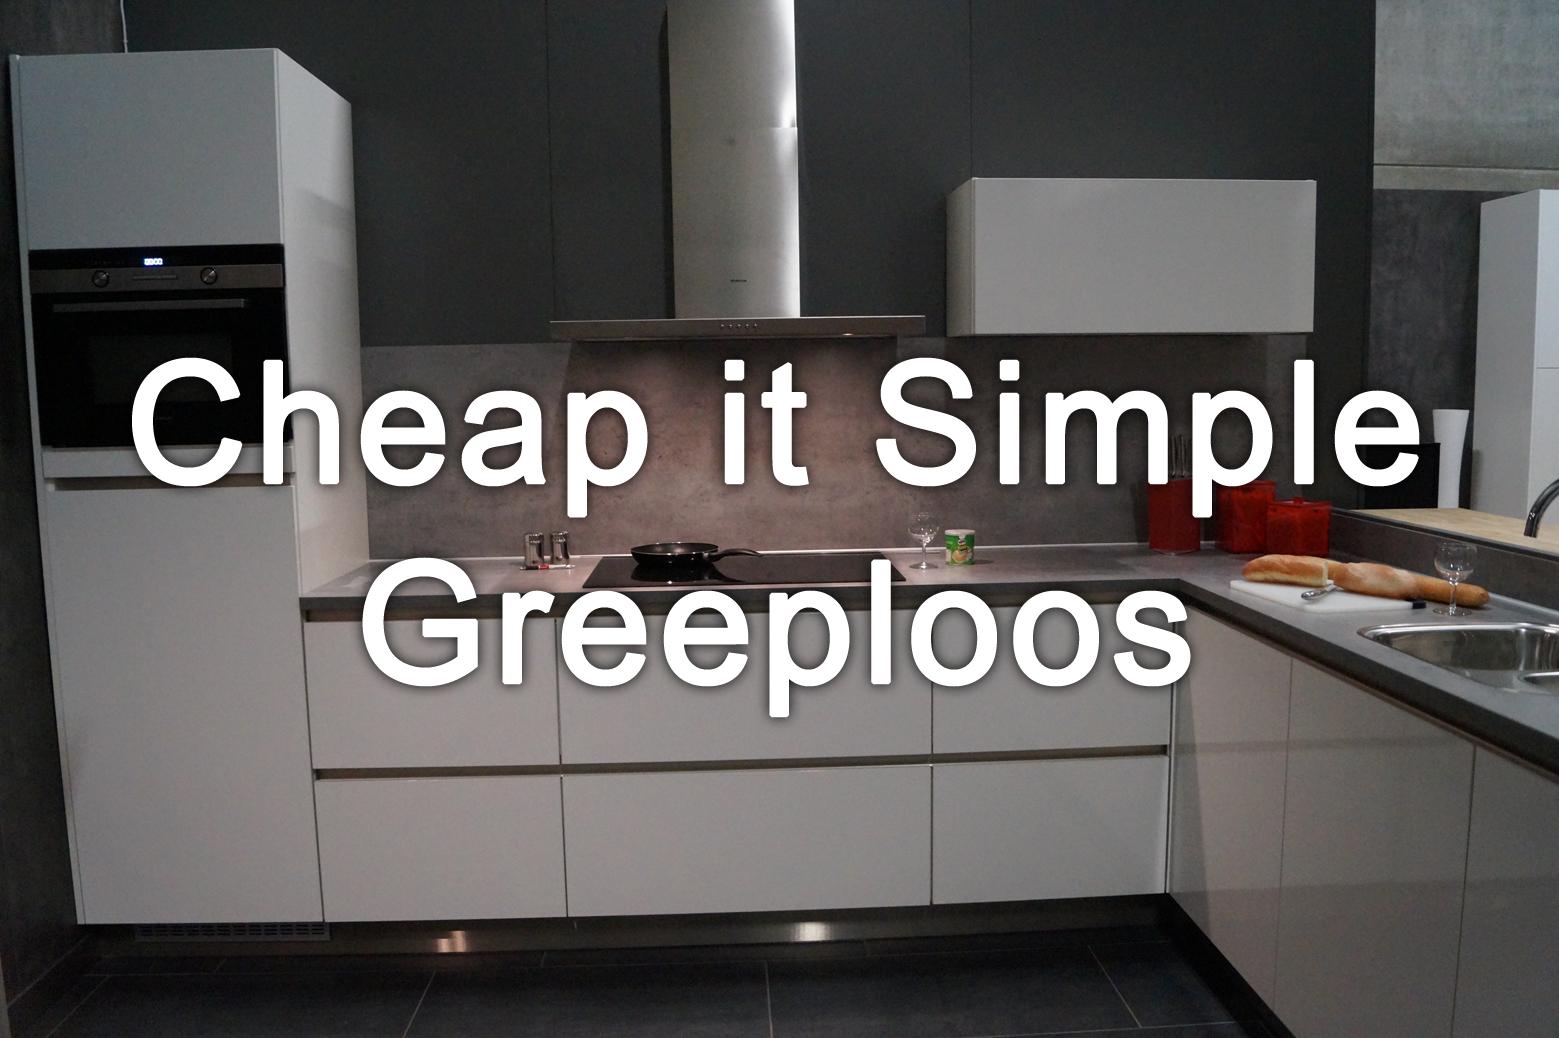 Cheap it simple